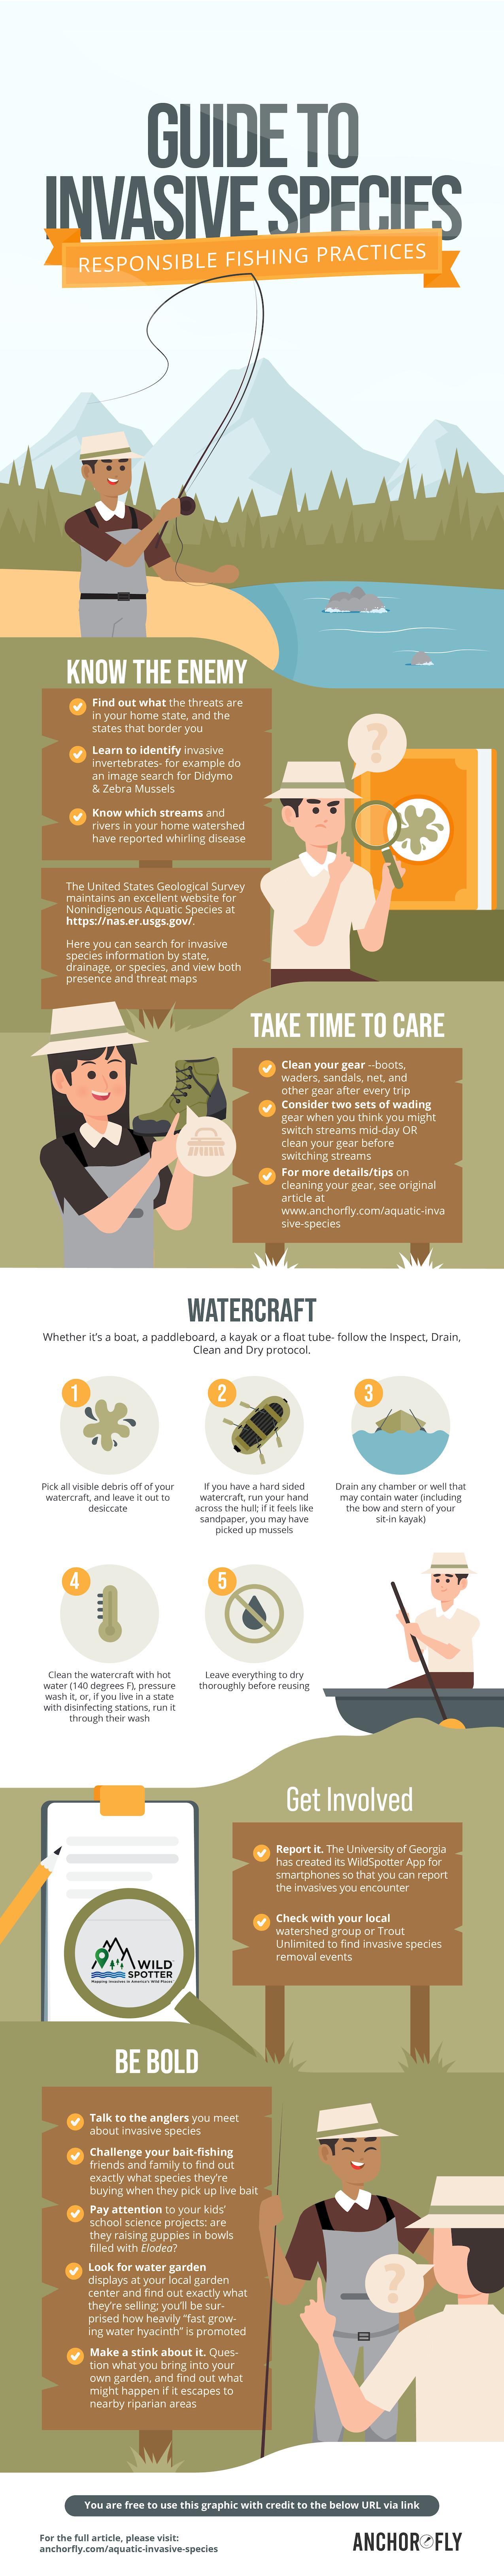 Aquatic-invasive-species-infographic